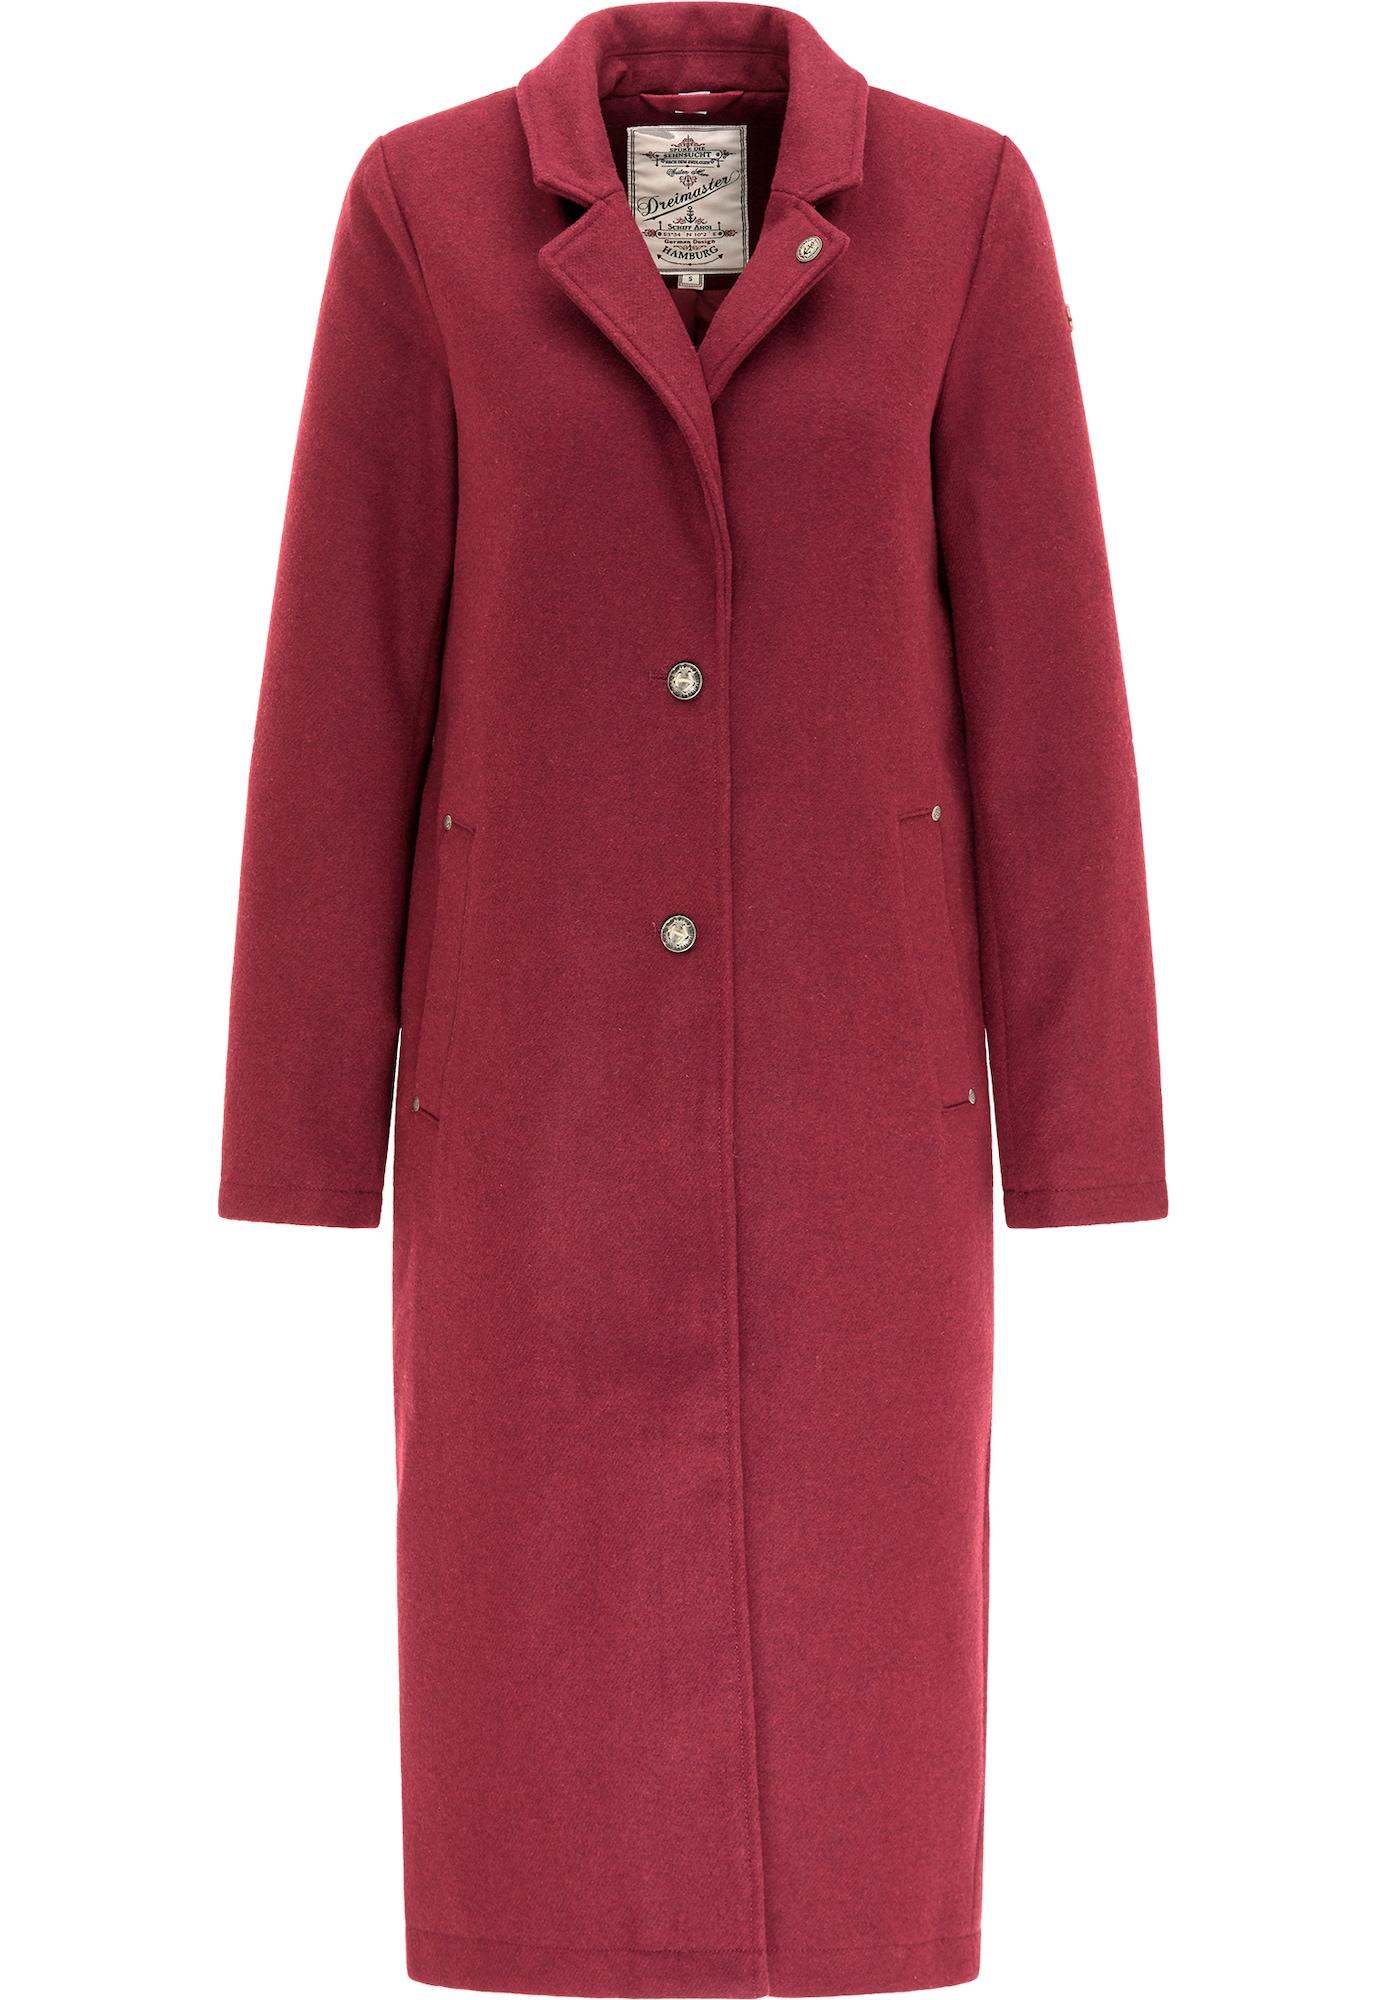 DreiMaster Vintage Demisezoninis paltas avietinė